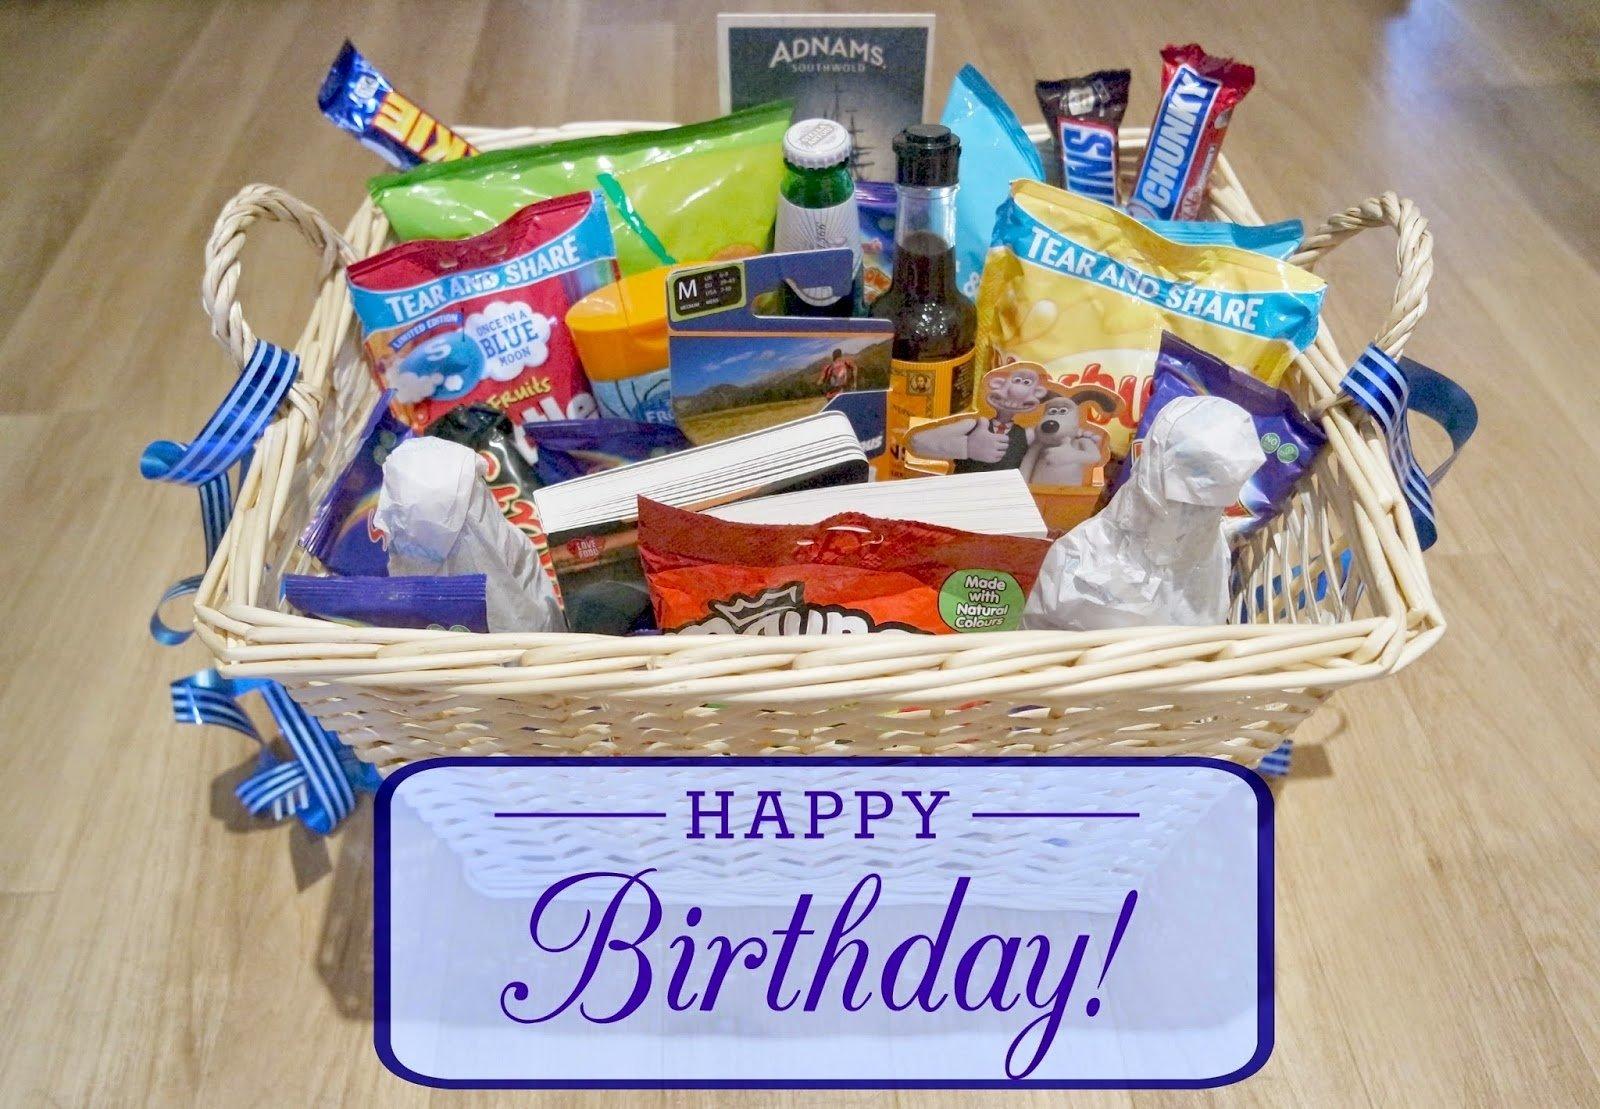 10 Spectacular Ideas For 50Th Birthday Present uptown peach my dads 50th birthday hamper mens gift ideas 1 2020